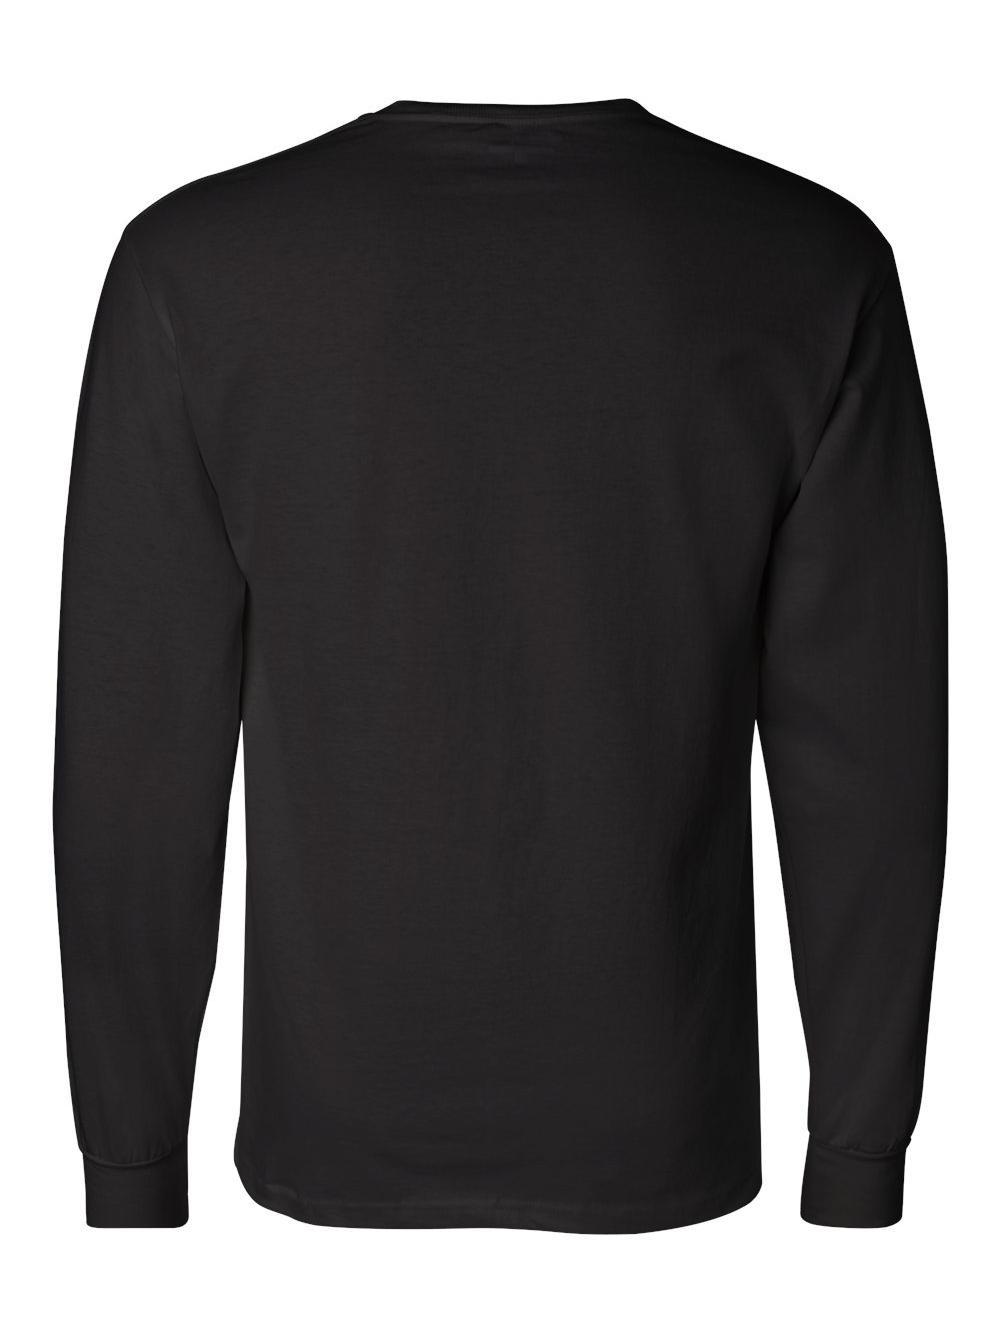 Champion-Long-Sleeve-T-Shirt-CC8C thumbnail 4